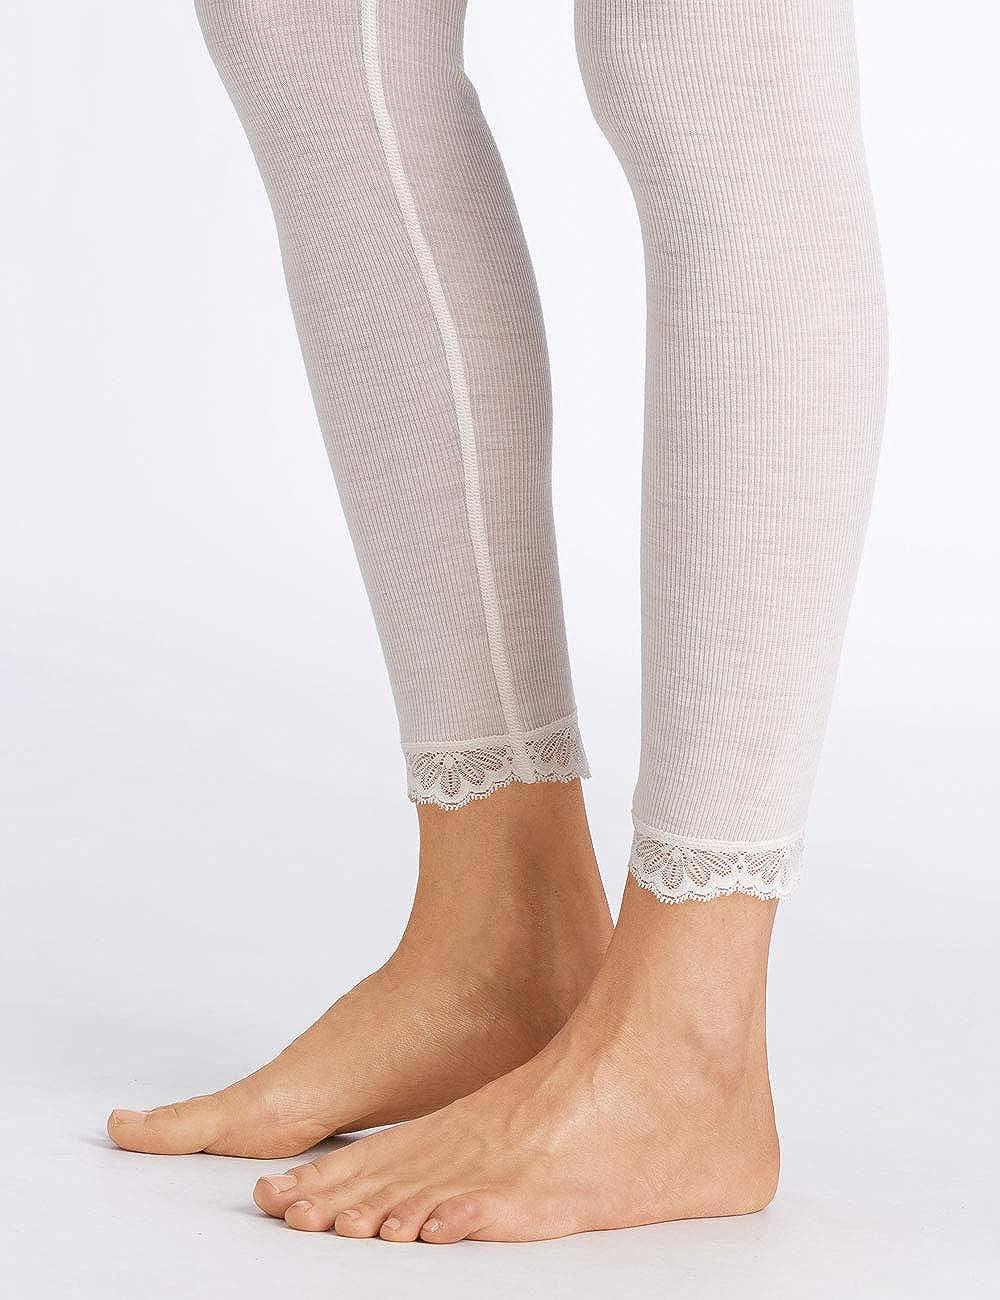 Hanro Woolen Lace Leggings Calzamaglia Termica Donna